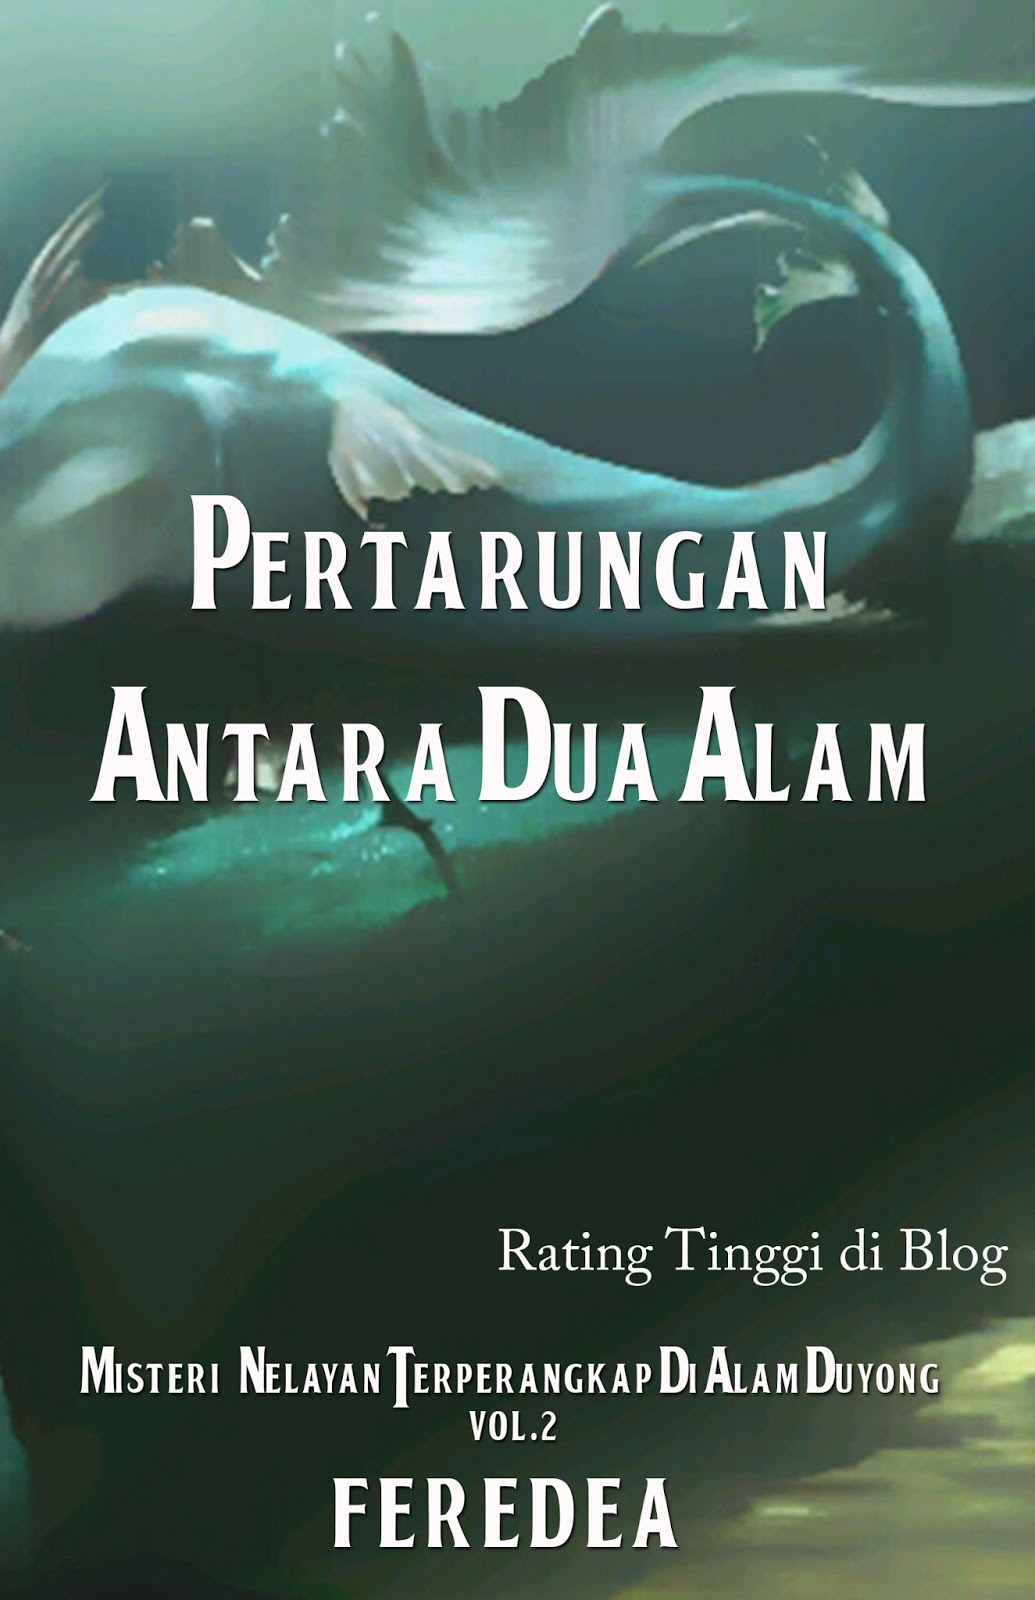 https://play.google.com/store/books/details/Feredea_Pertarungan_Antara_Dua_Alam?id=D6WaAgAAQBAJ